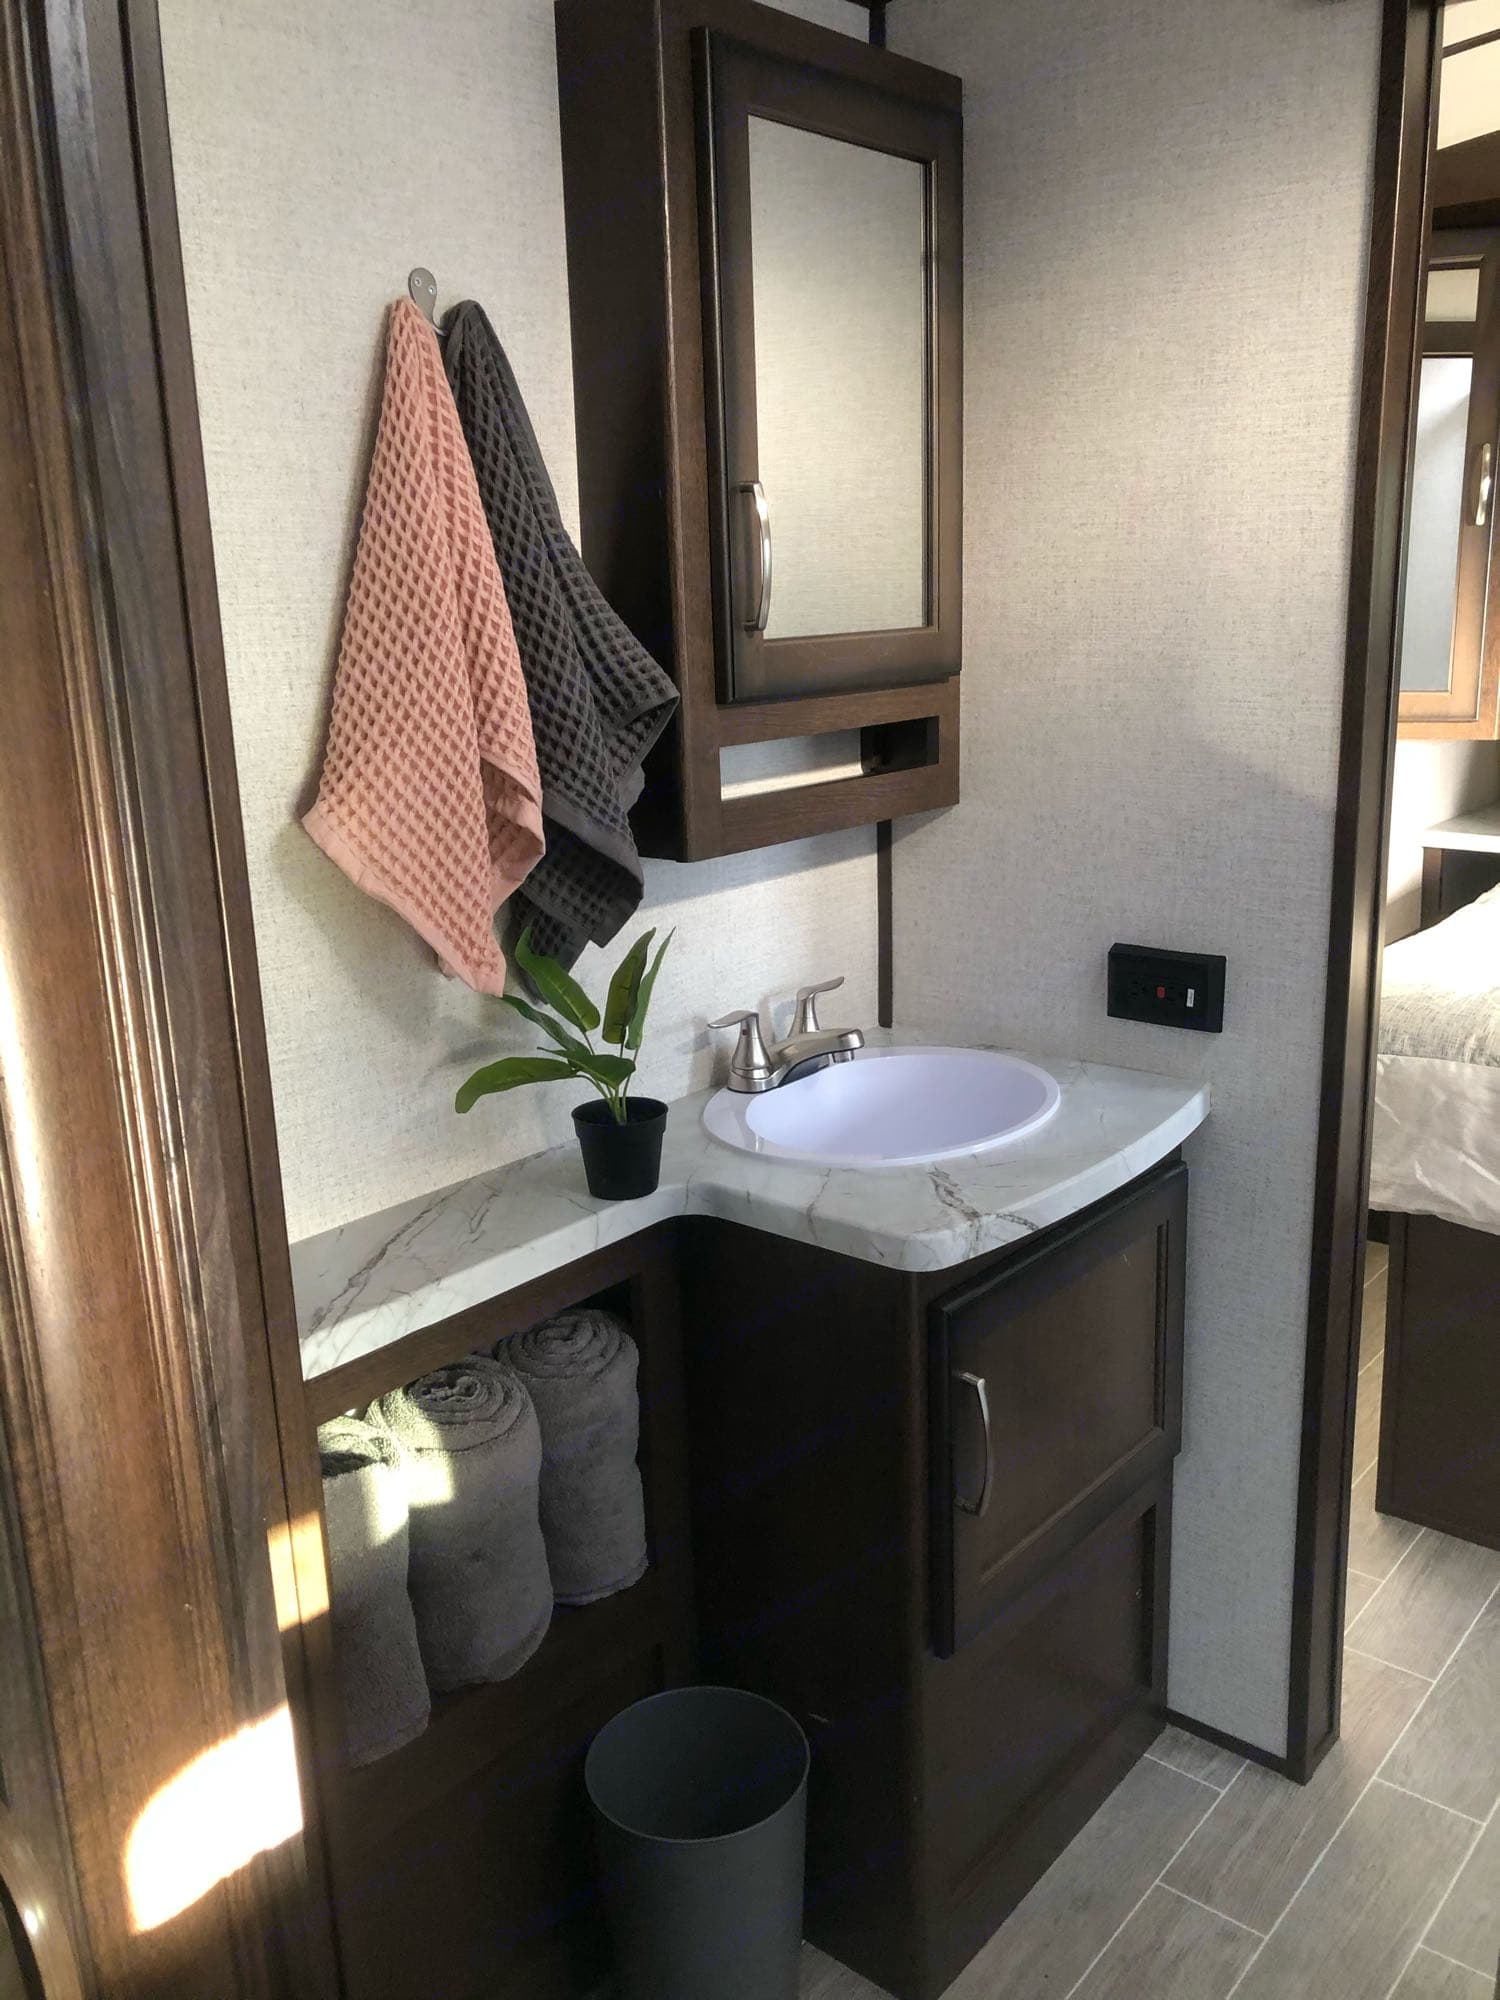 Bathroom sink. Dutchmen Other 2020